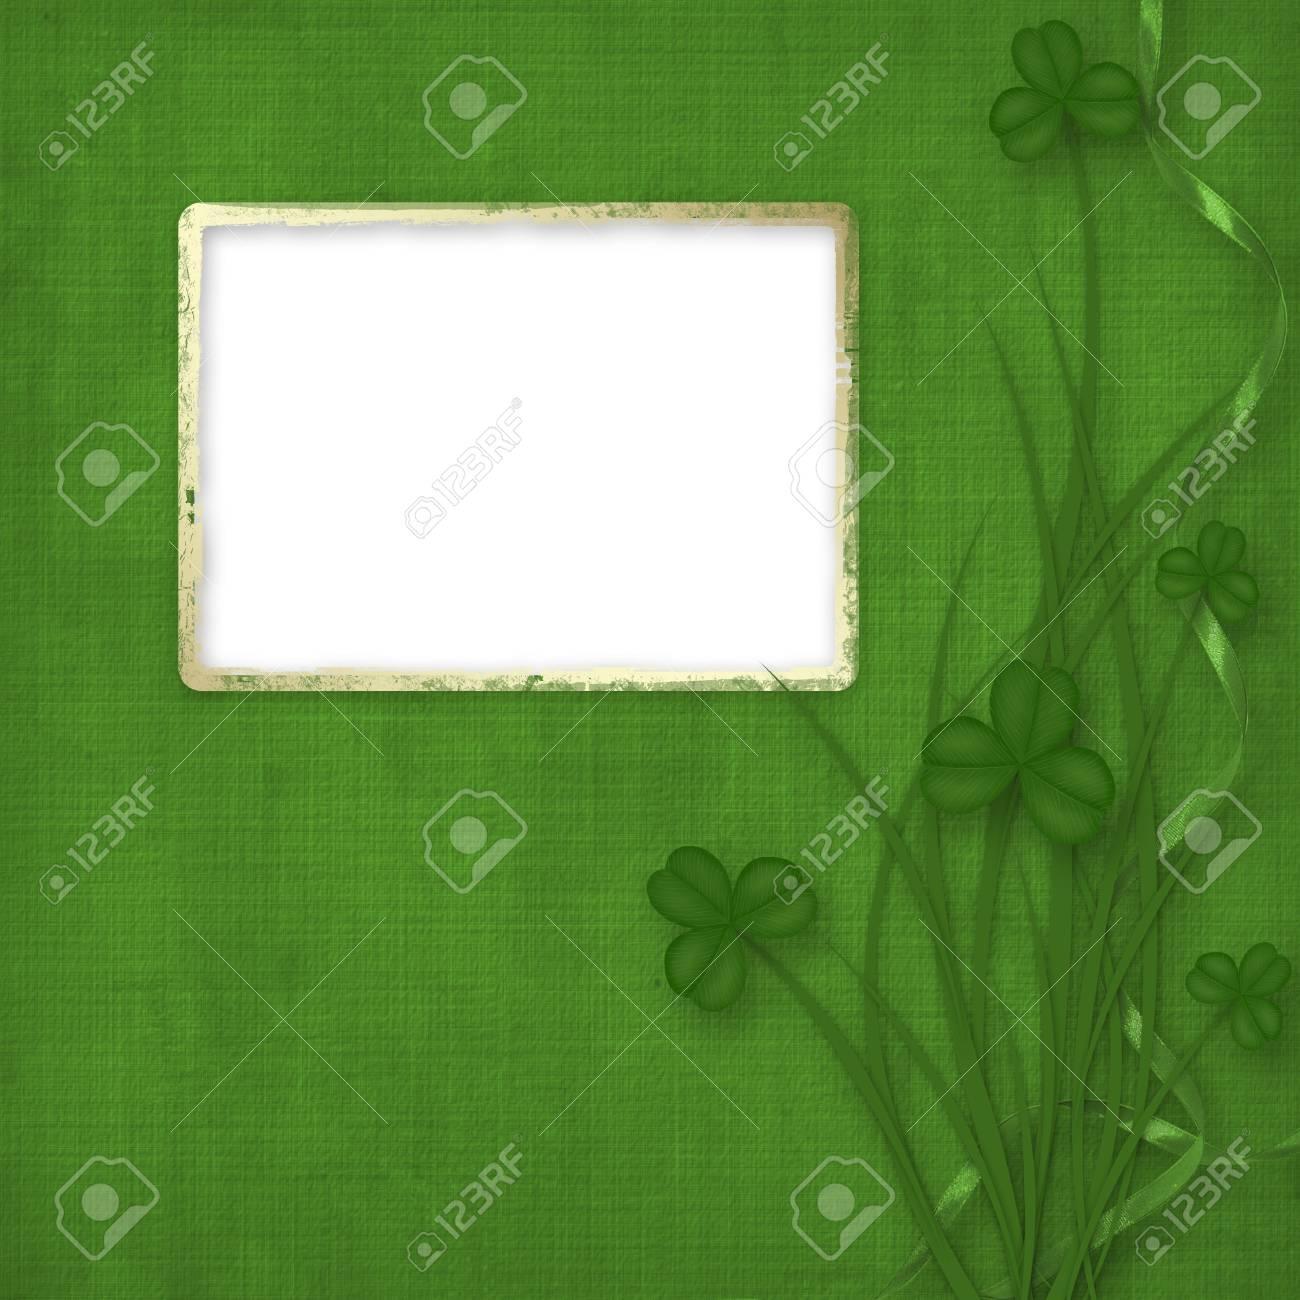 Design for St. Patrick's Day. Flower ornament. Stock Photo - 6353675